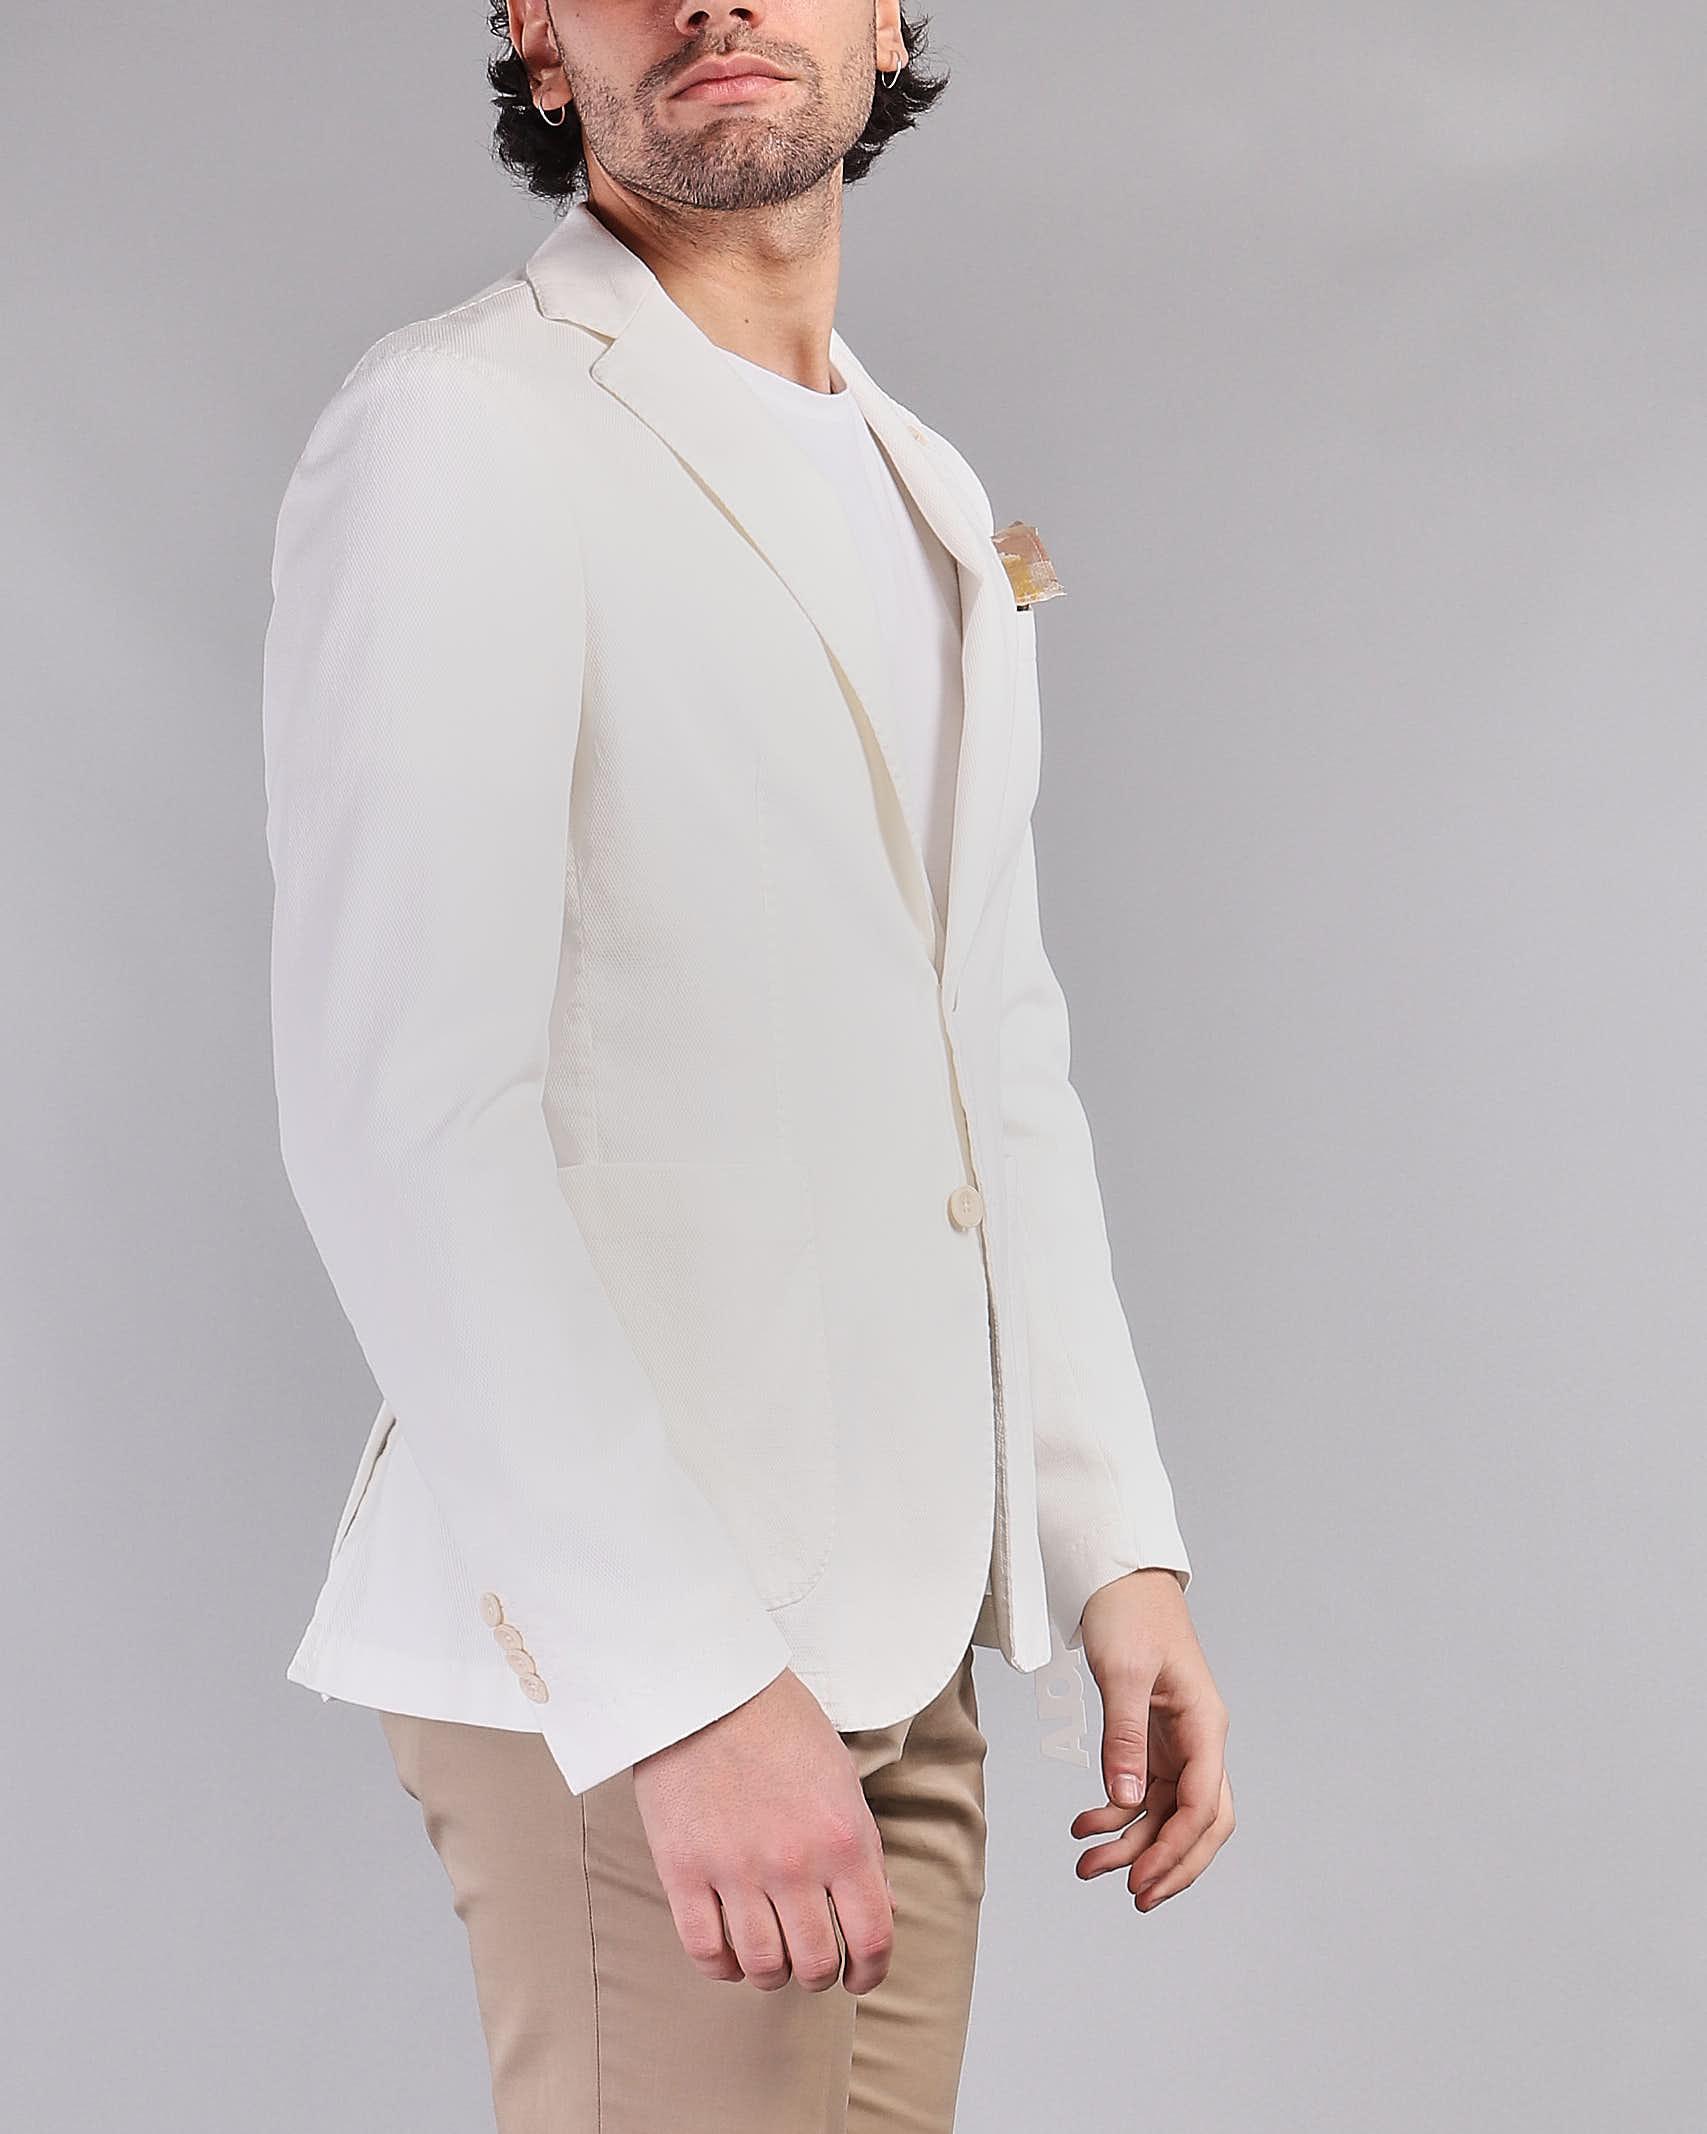 Giacca in cotone Manuel Ritz MANUEL RITZ   Giacca   3032G2728T2130082